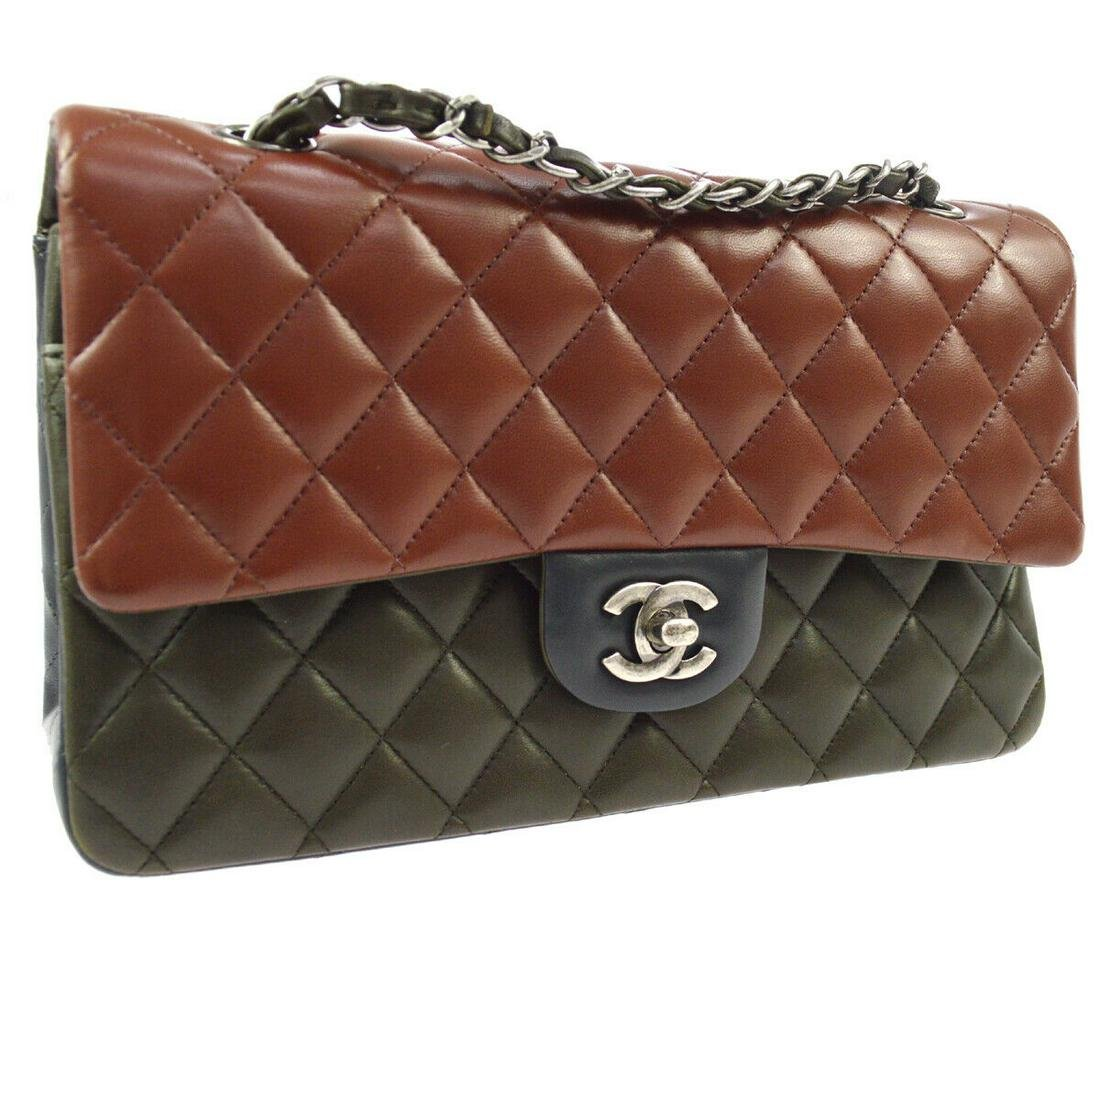 Authentic CHANEL Leather Shoulder Bag